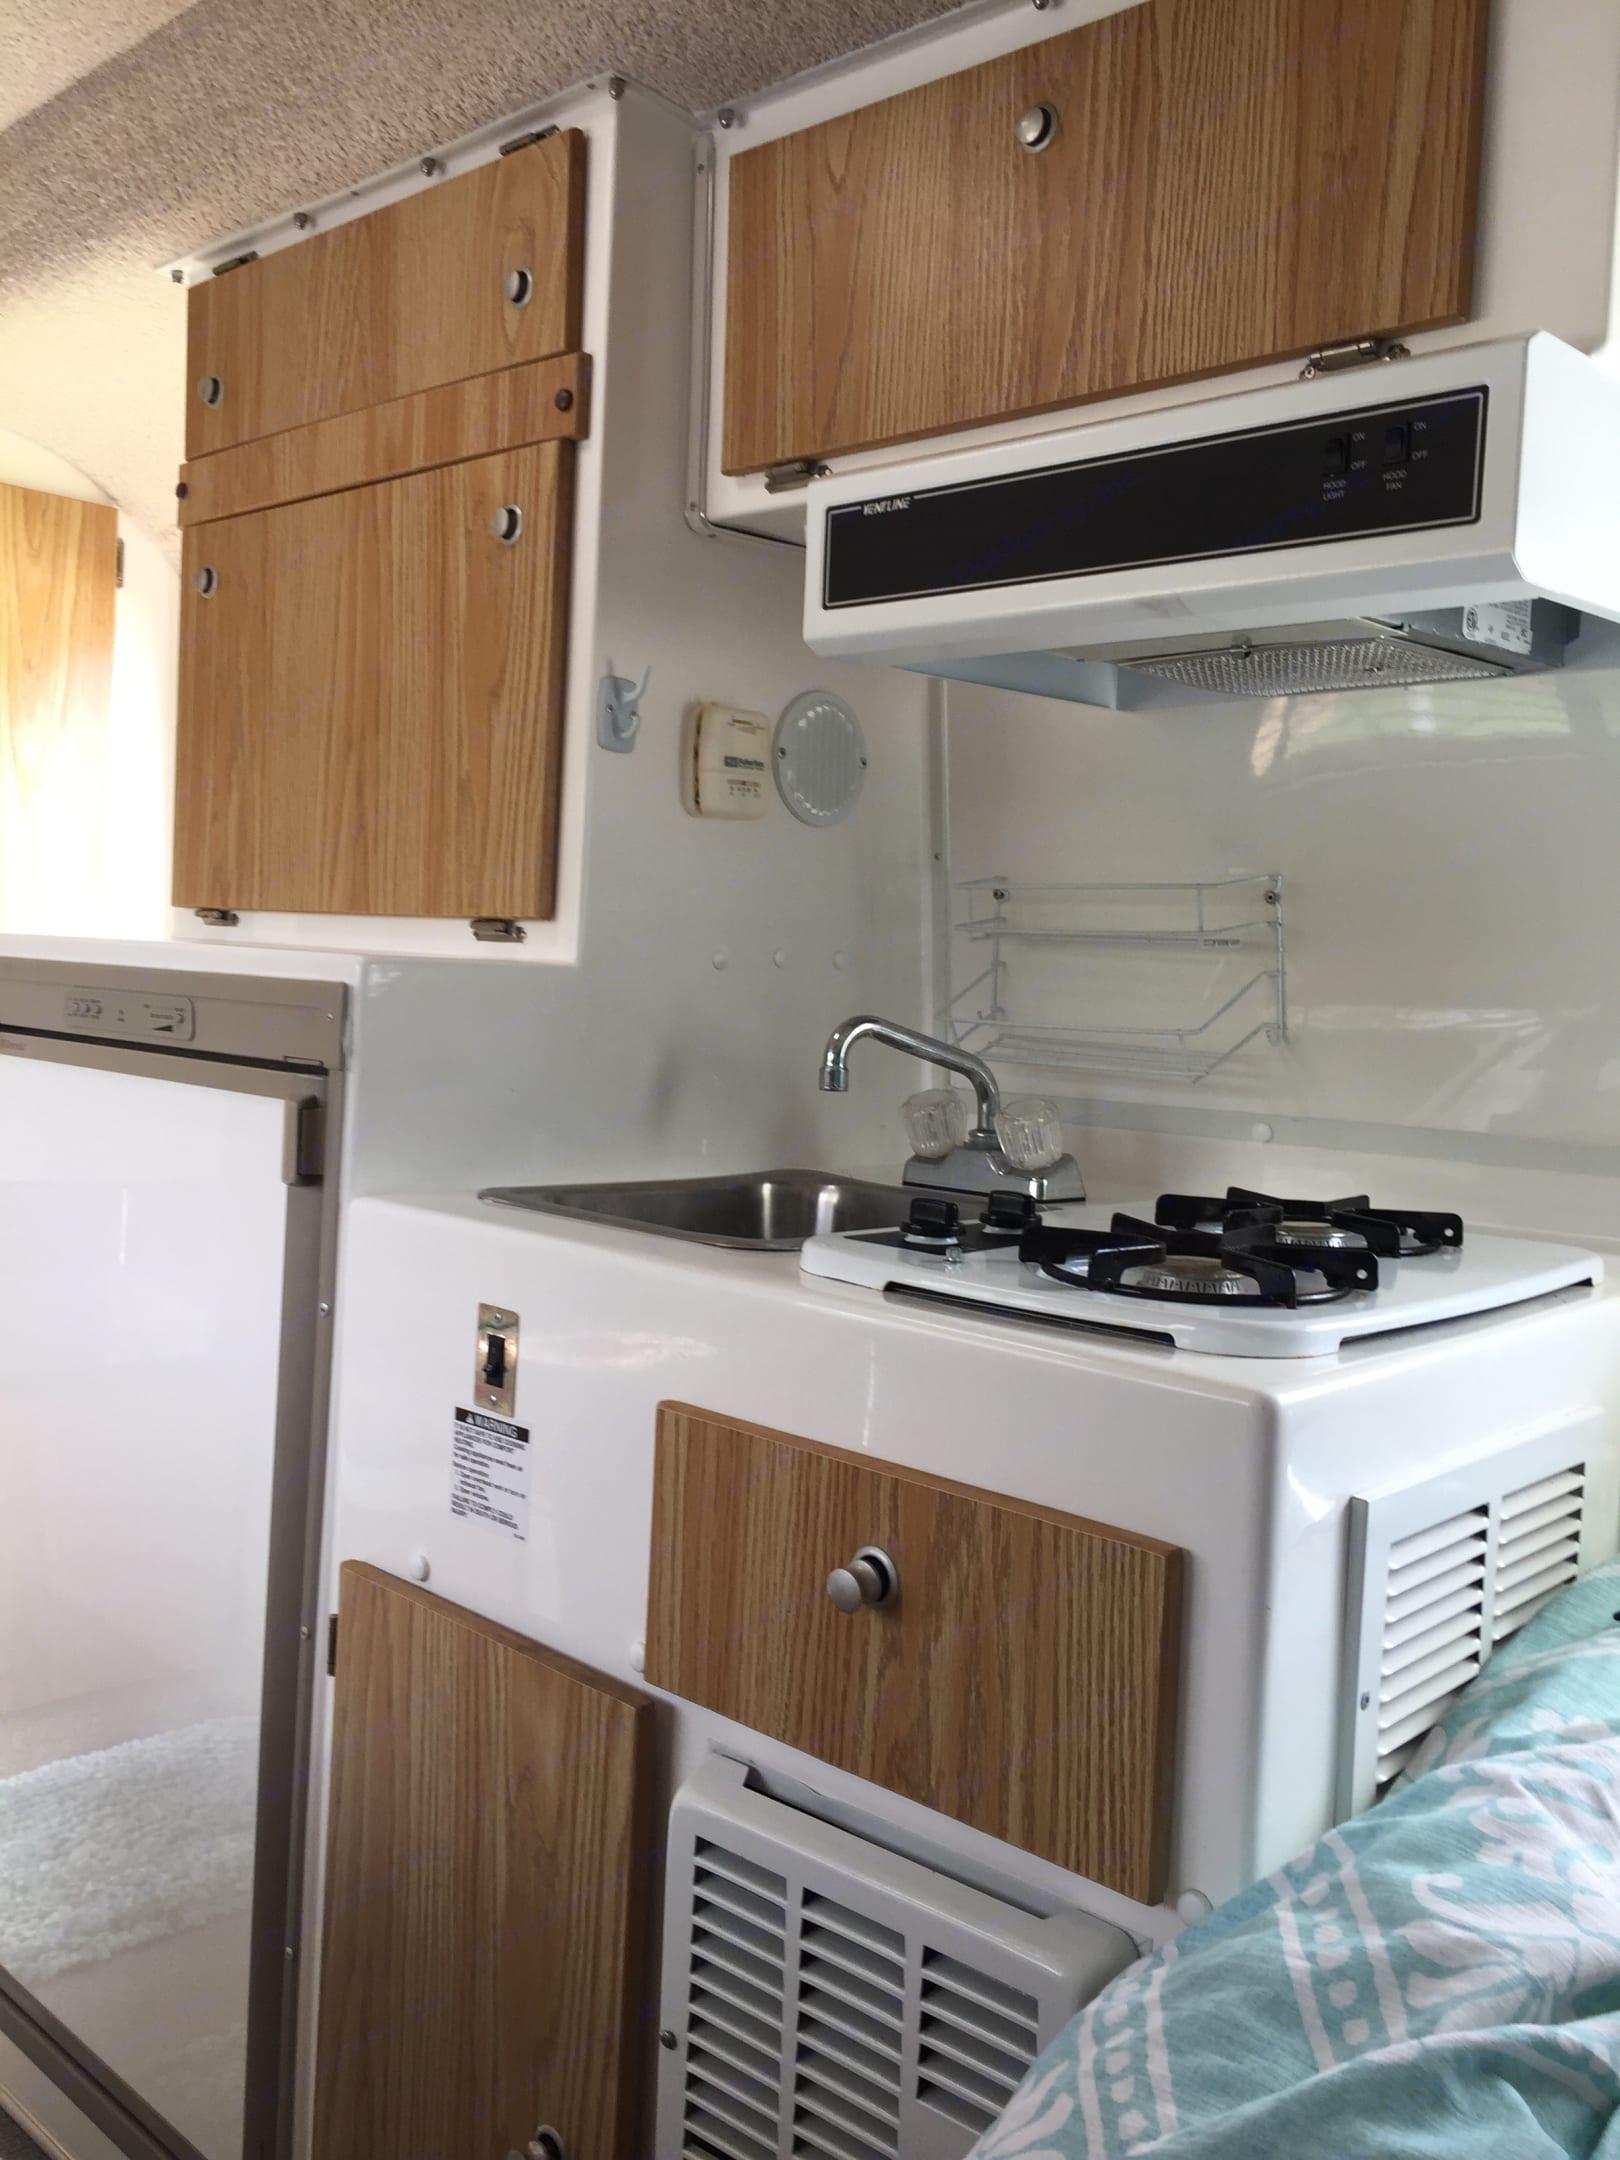 Stove and refrigerator/ freezer. Casita 17' Spirit Deluxe 2008